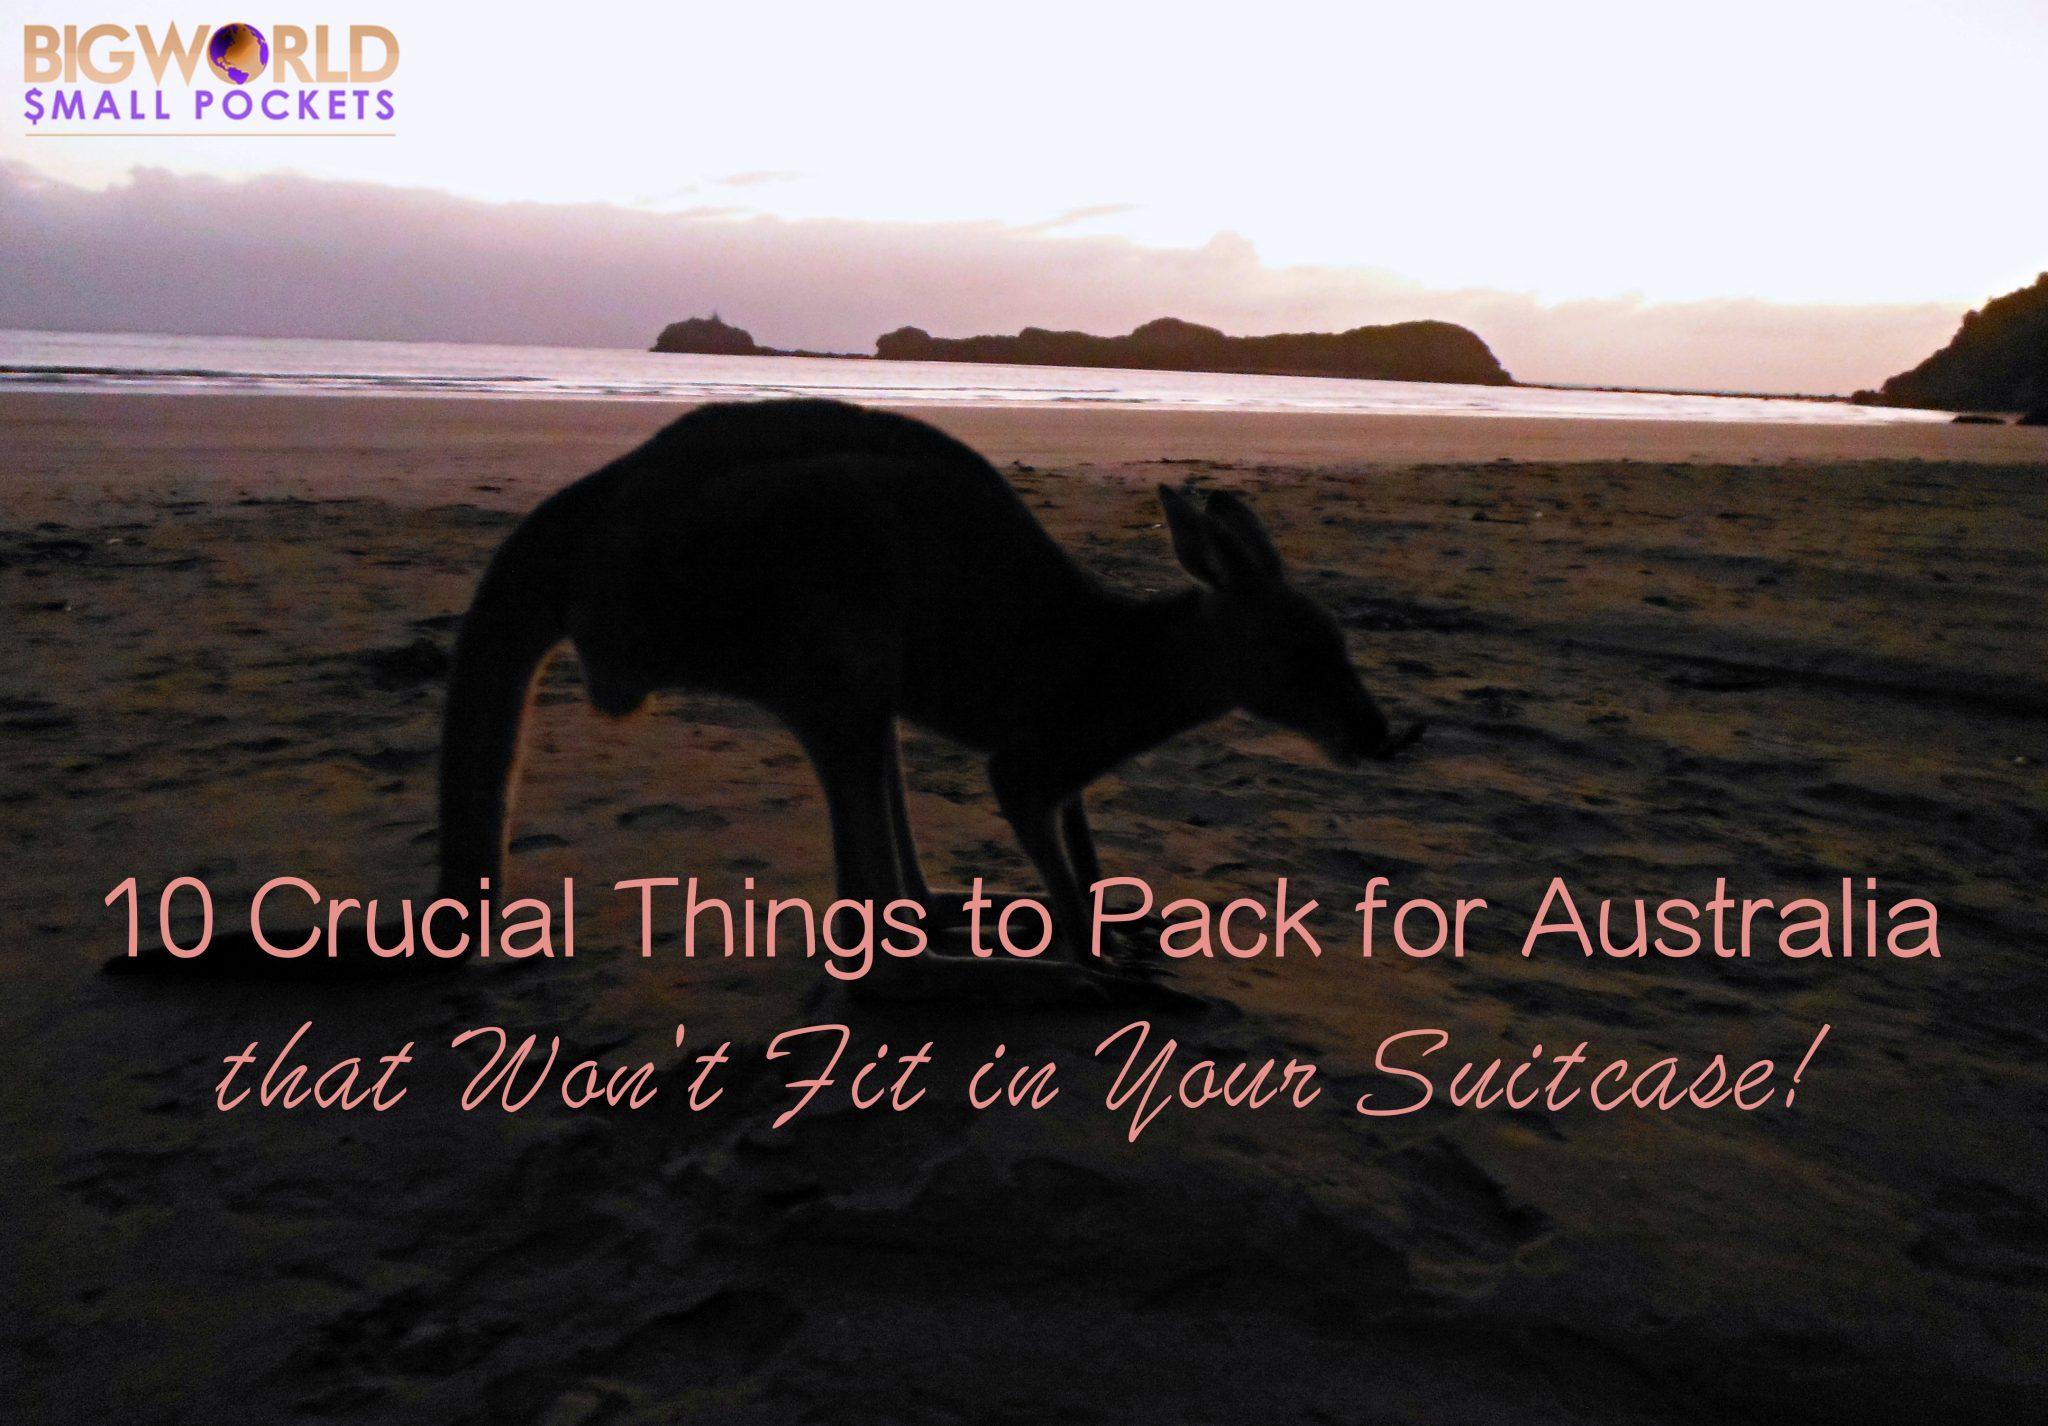 13 Crucila Things to Pack for Australia